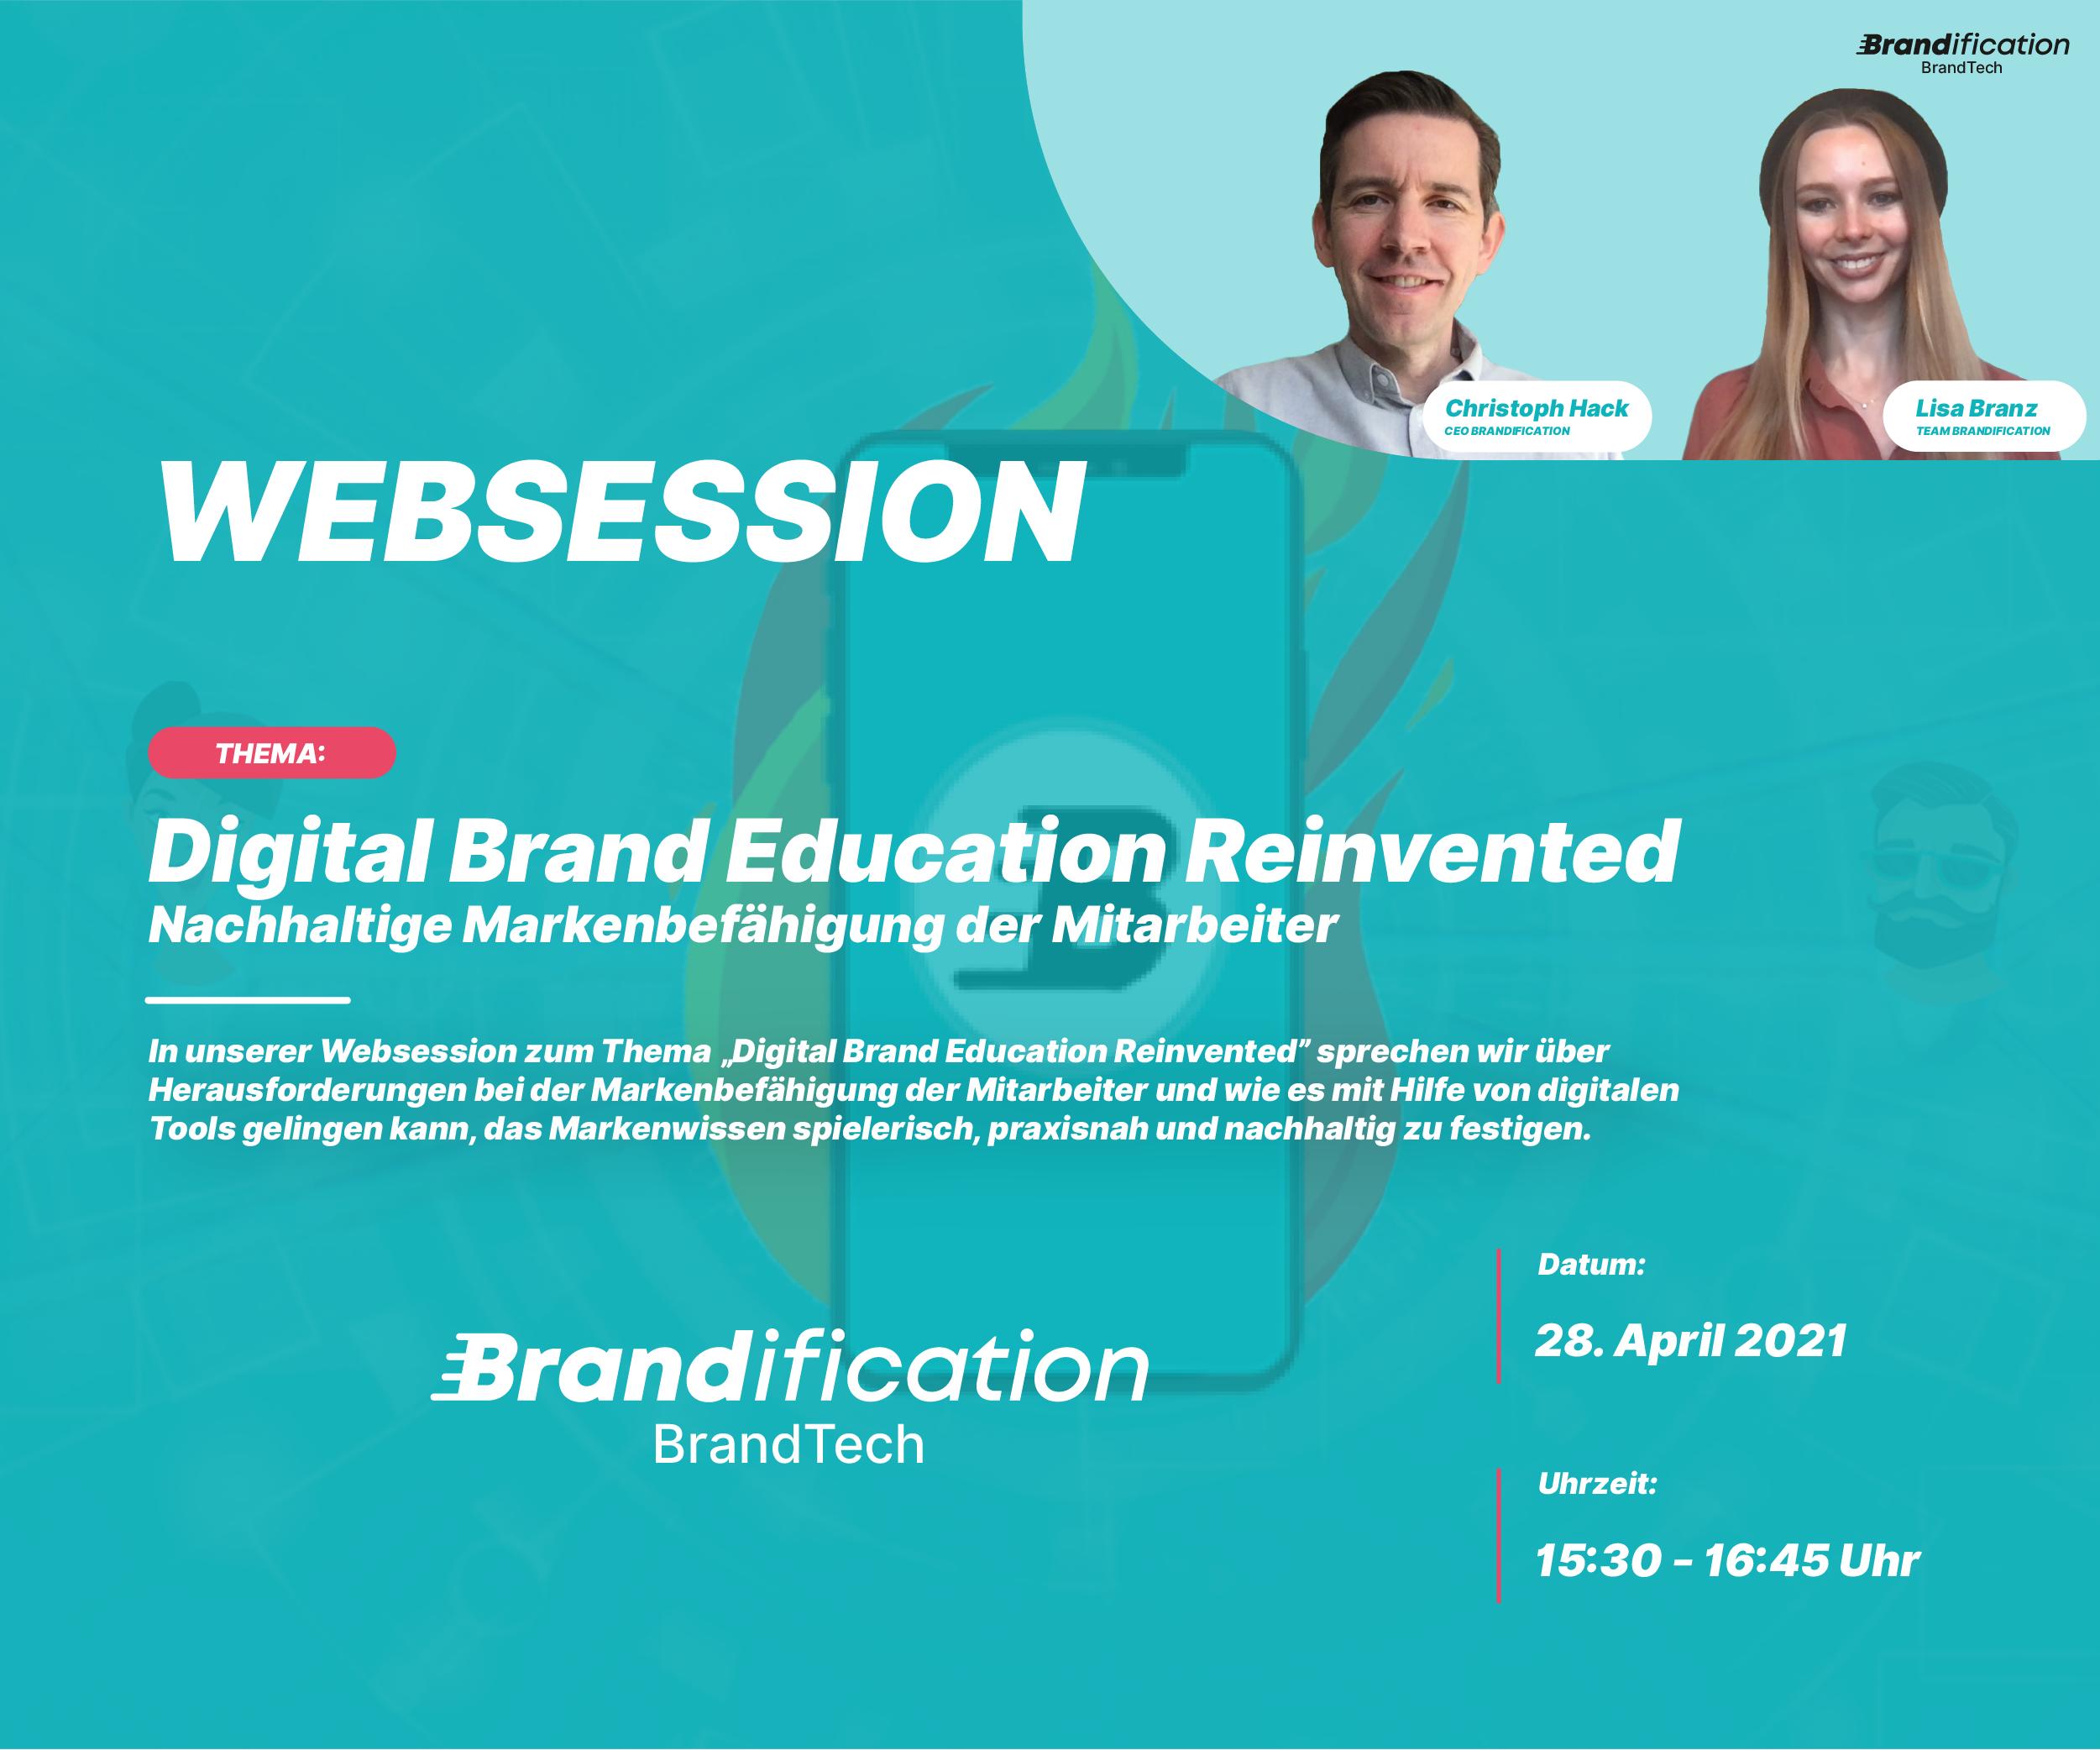 Websession zum Thema Digital Brand Education Reinvented